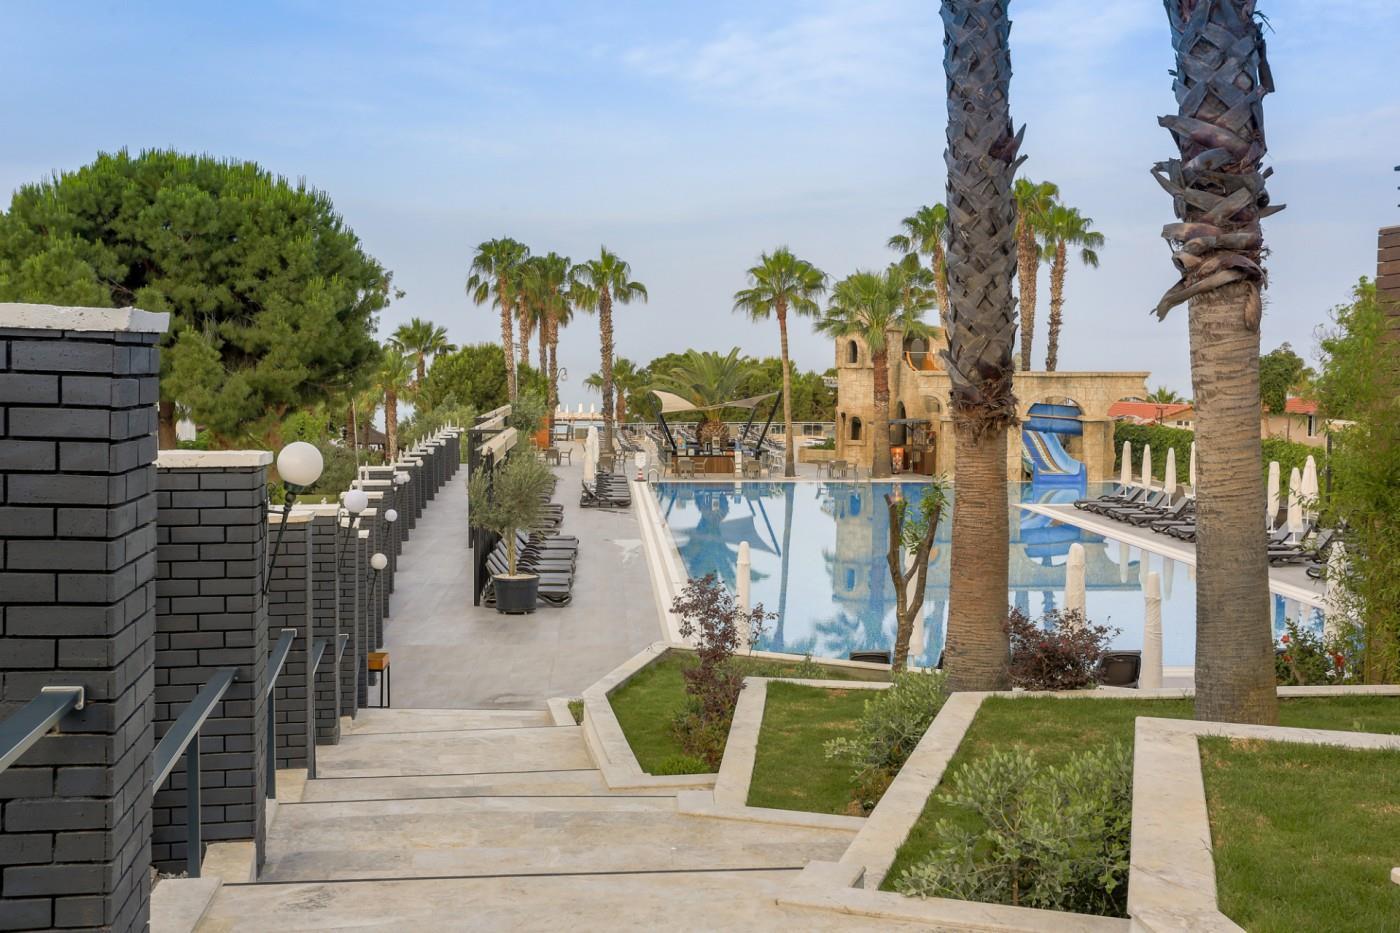 http://www.orextravel.sk/OREX/hotelphotos/thalia-unique-area-001.jpg